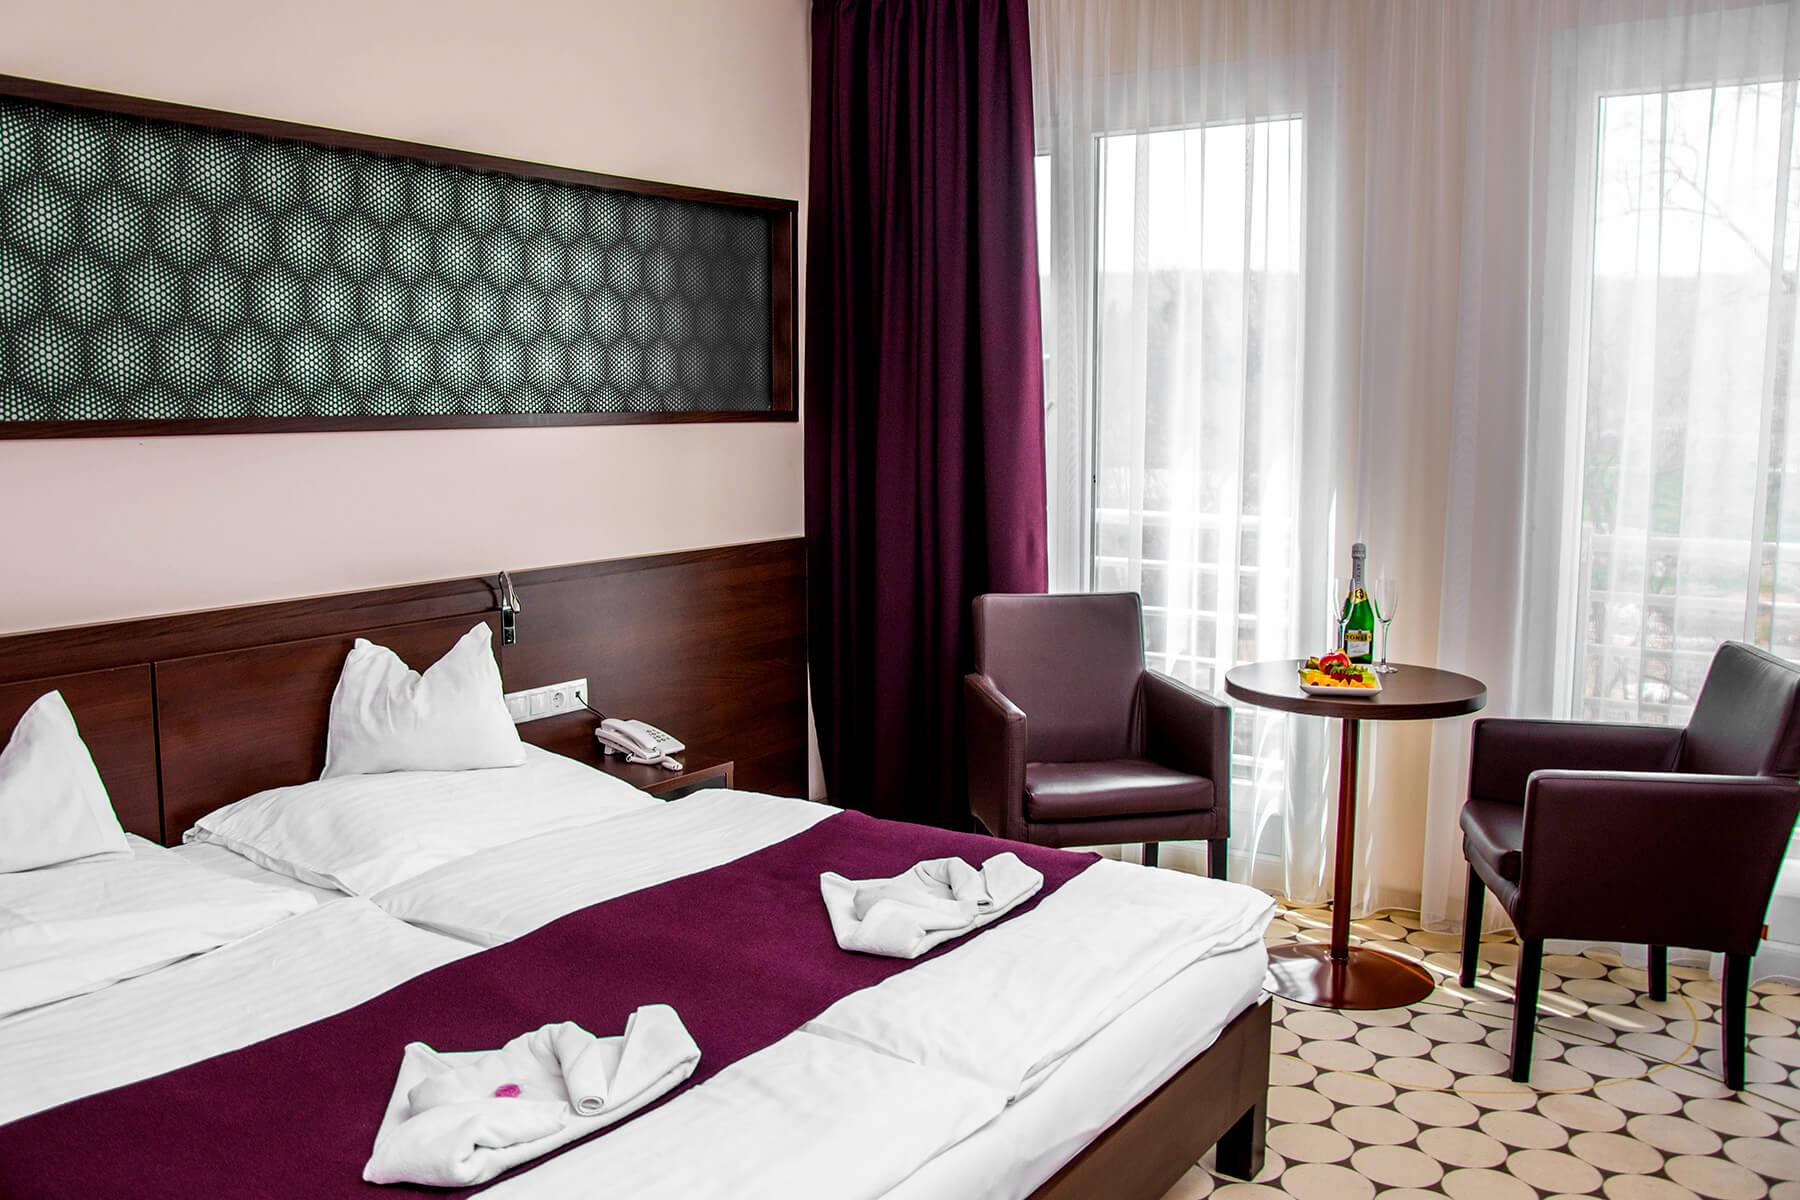 hotel-aurora-szobak7.jpg